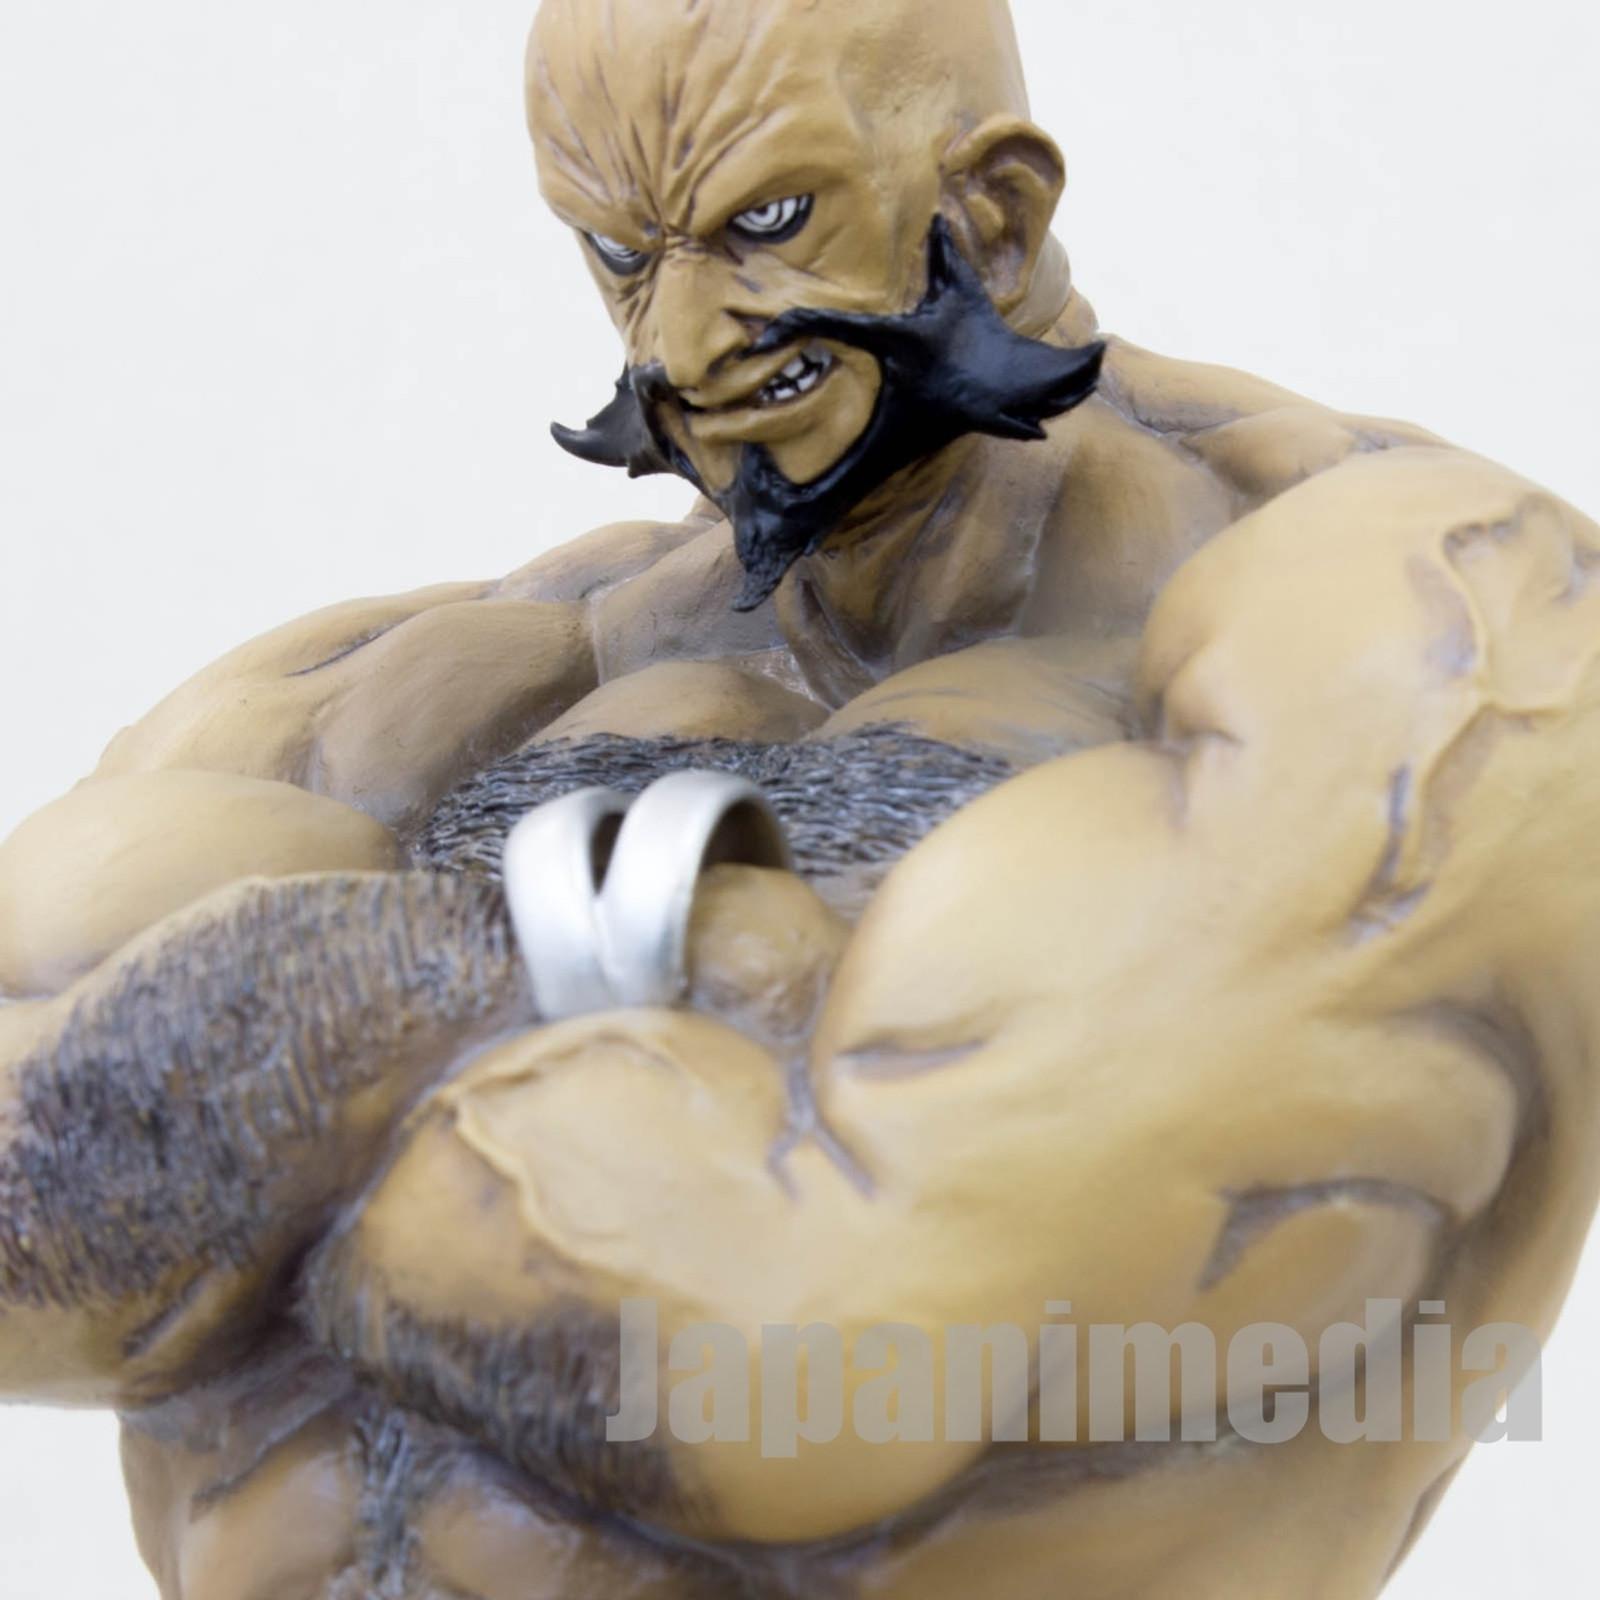 Gurren Lagann Lordgenome Premium Sofubi Figure Rasen King Banpresto JAPAN ANIME